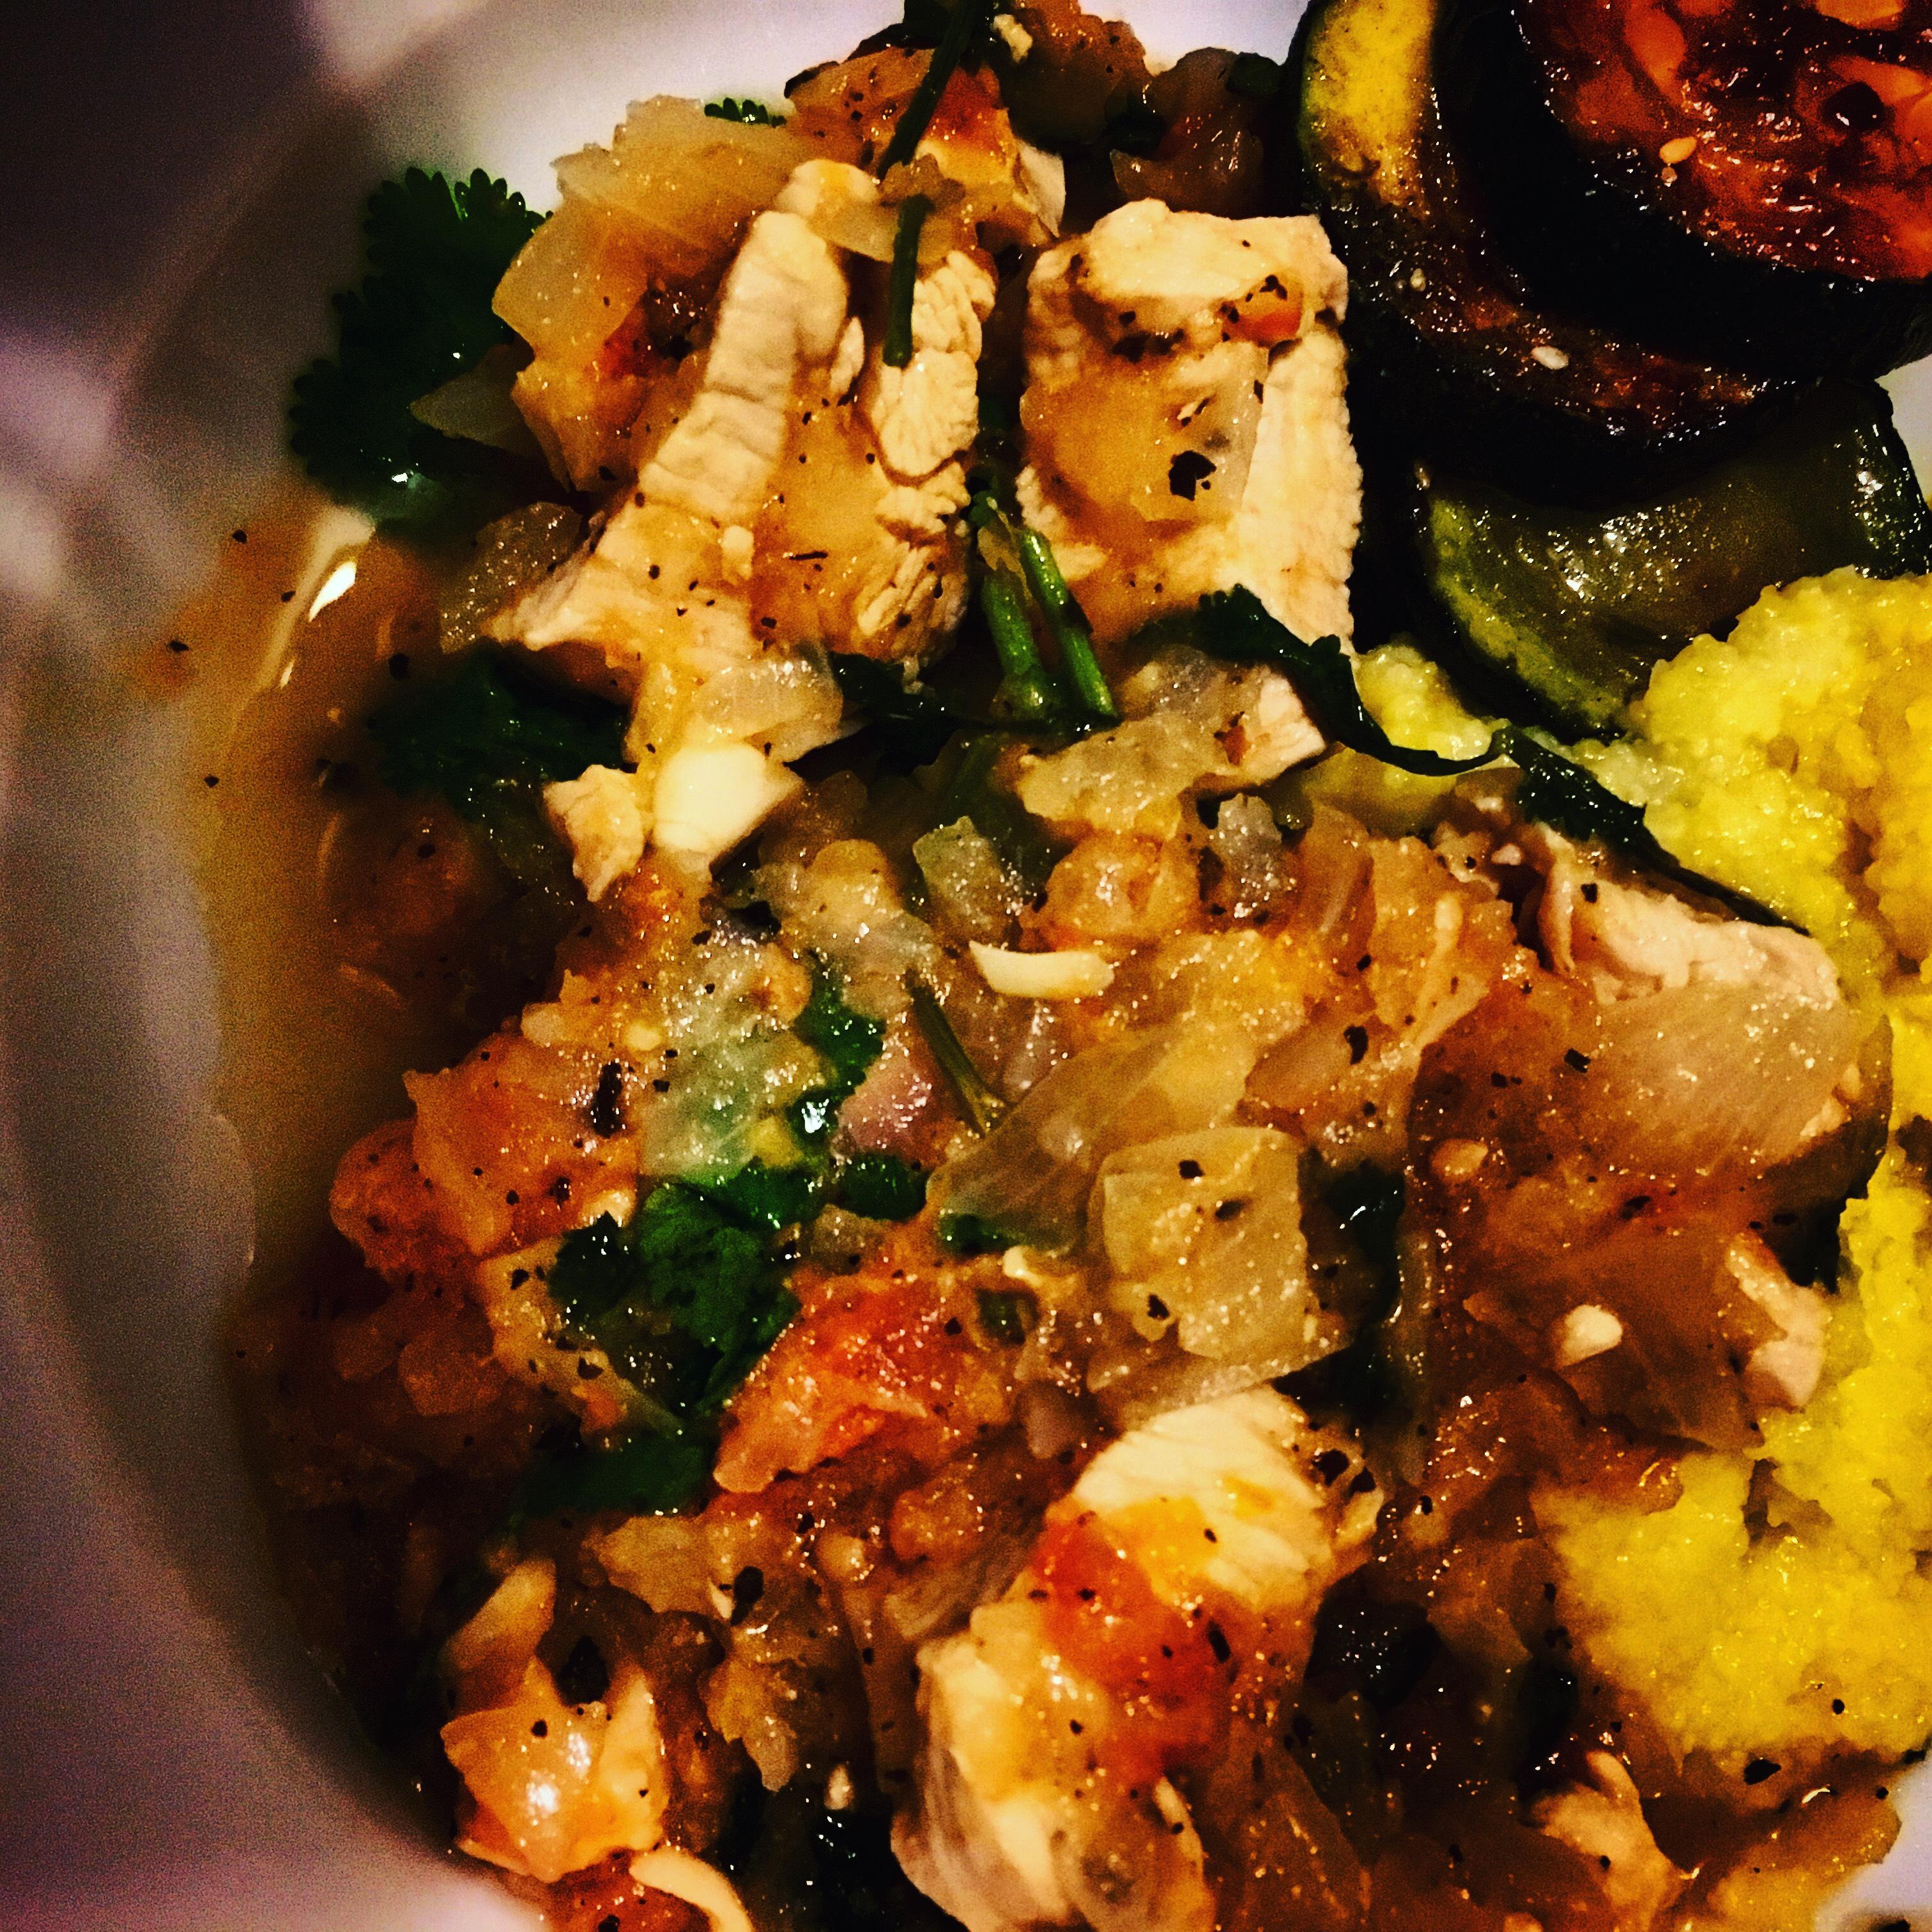 Chicken stew with tomato, cilantro, and onion, with cornmeal porridge and zucchini medallions